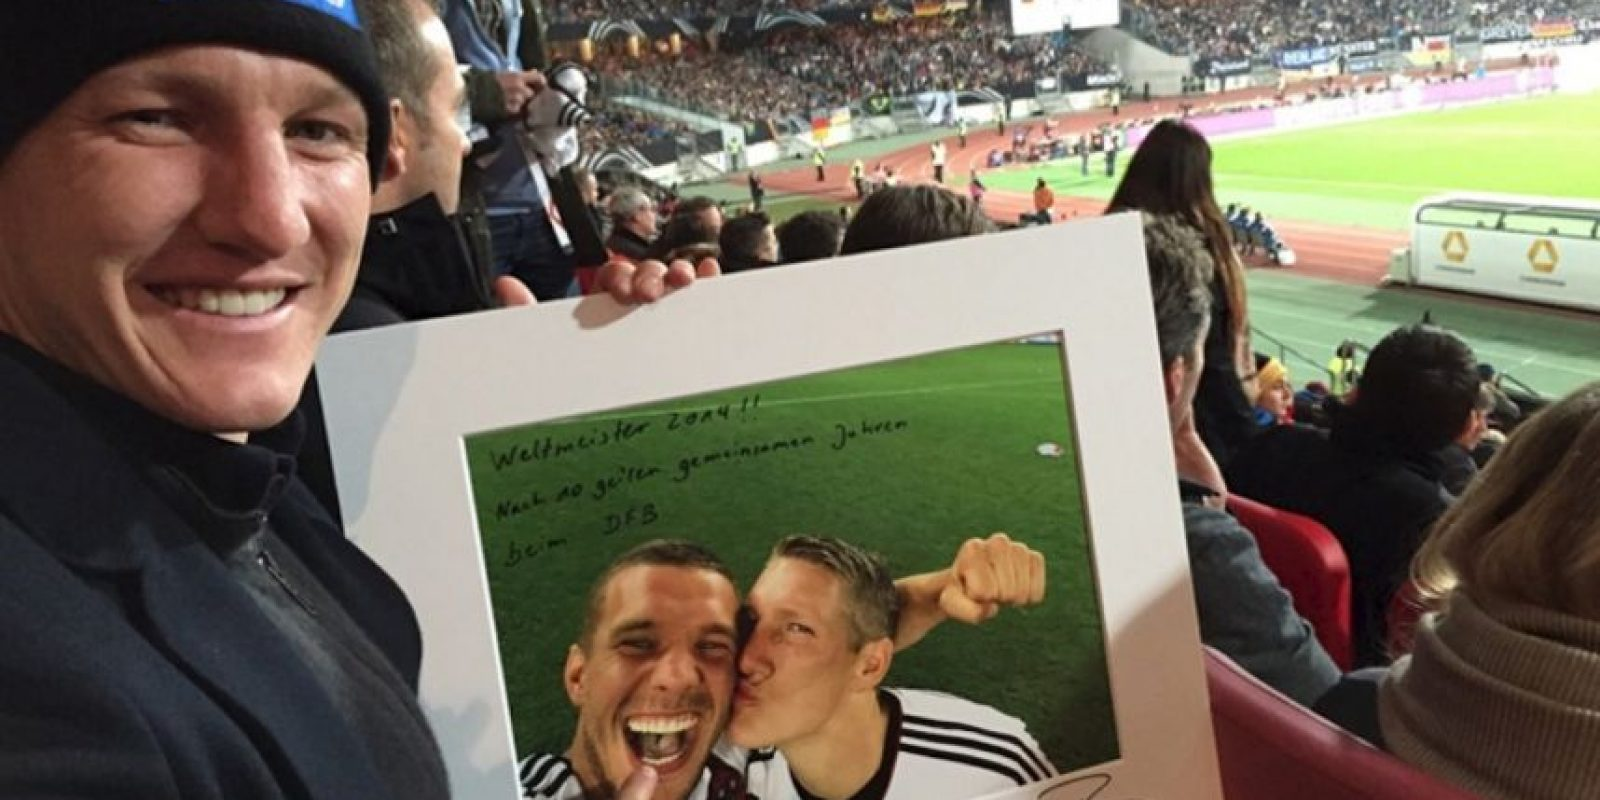 La mítica foto de Bastian Schweinsteiger y Lukas Podolski. Foto:unitedcharity.de